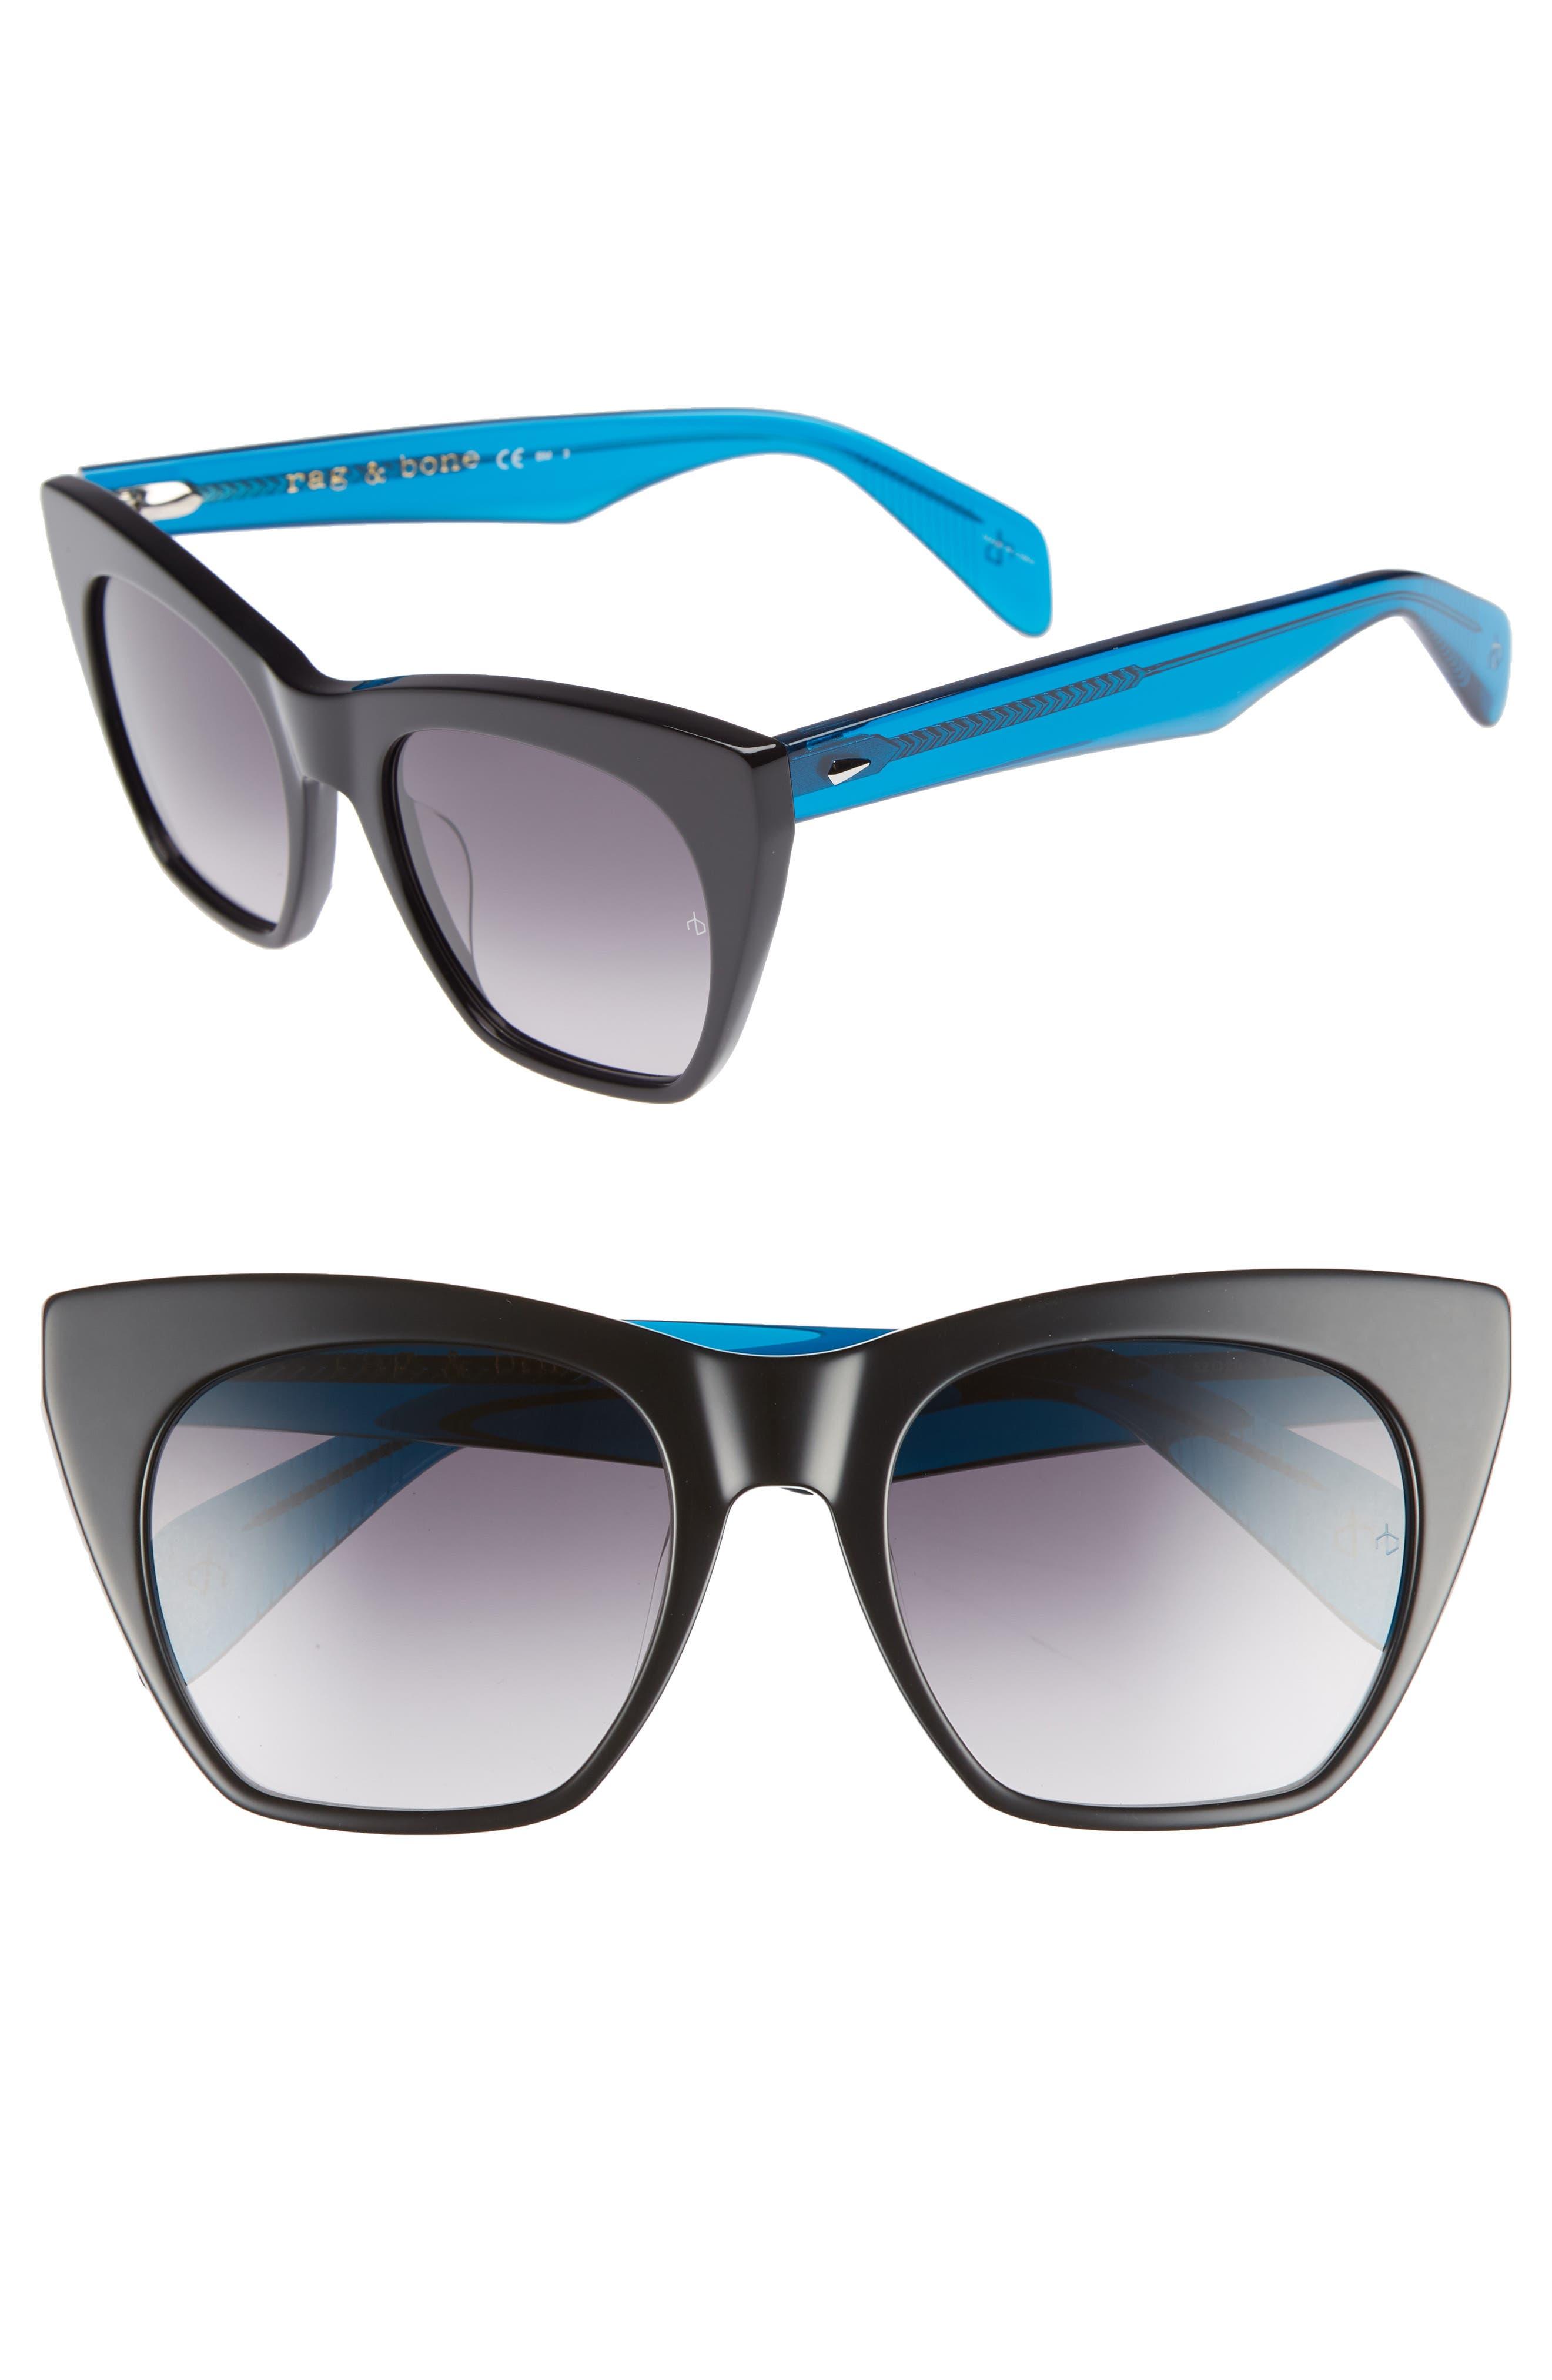 52mm Cat Eye Sunglasses,                         Main,                         color, BLACK/ BLUE